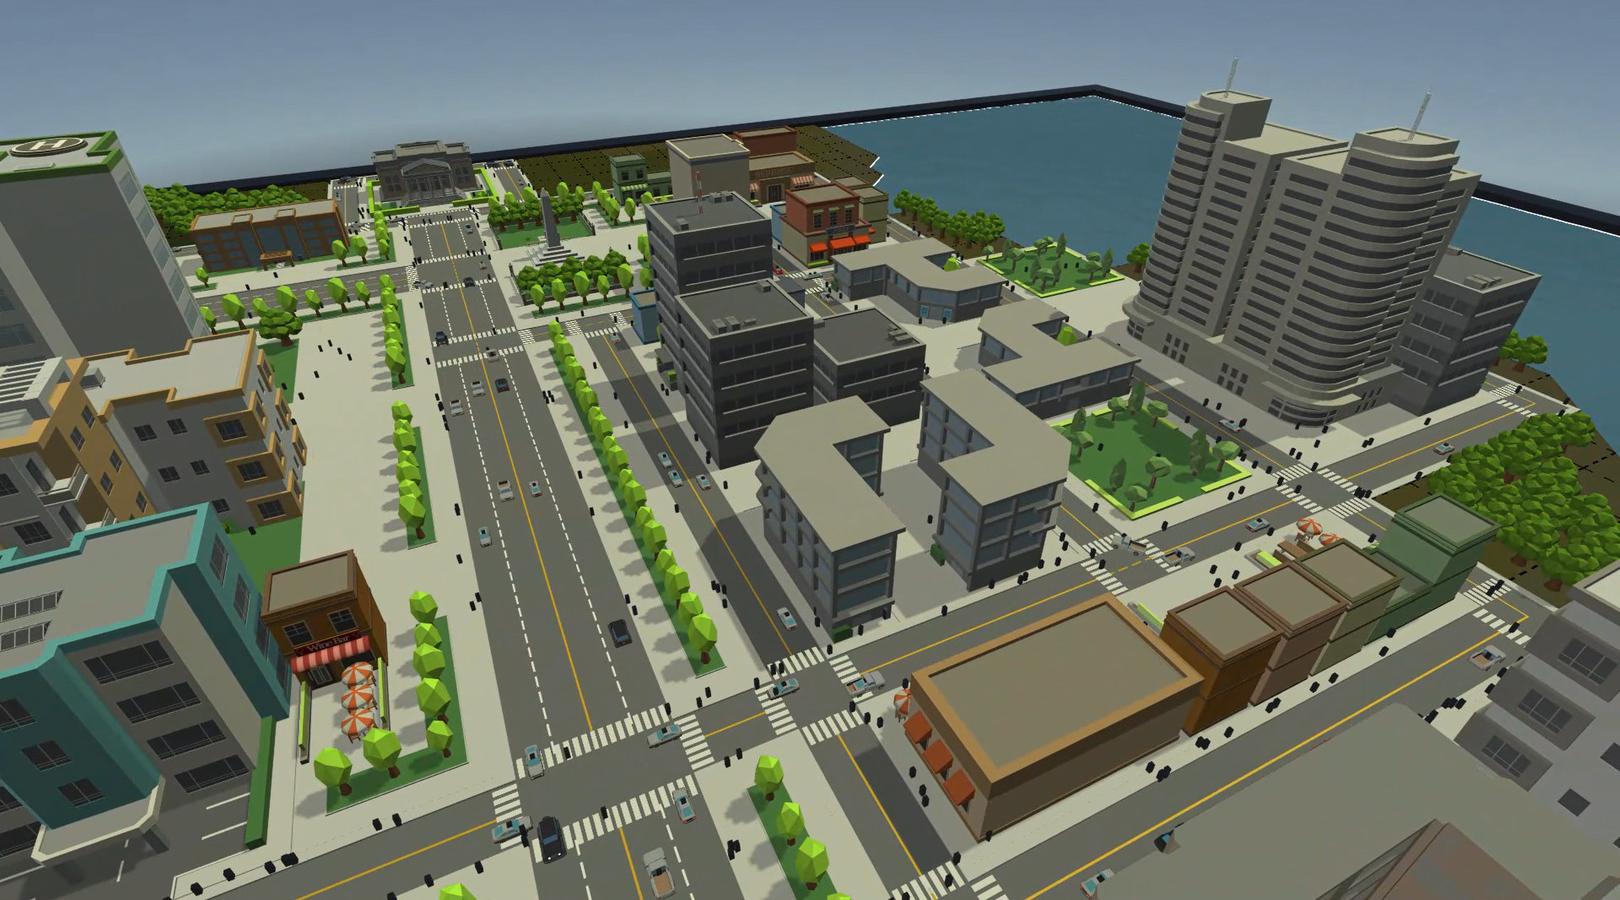 Silicon City Street